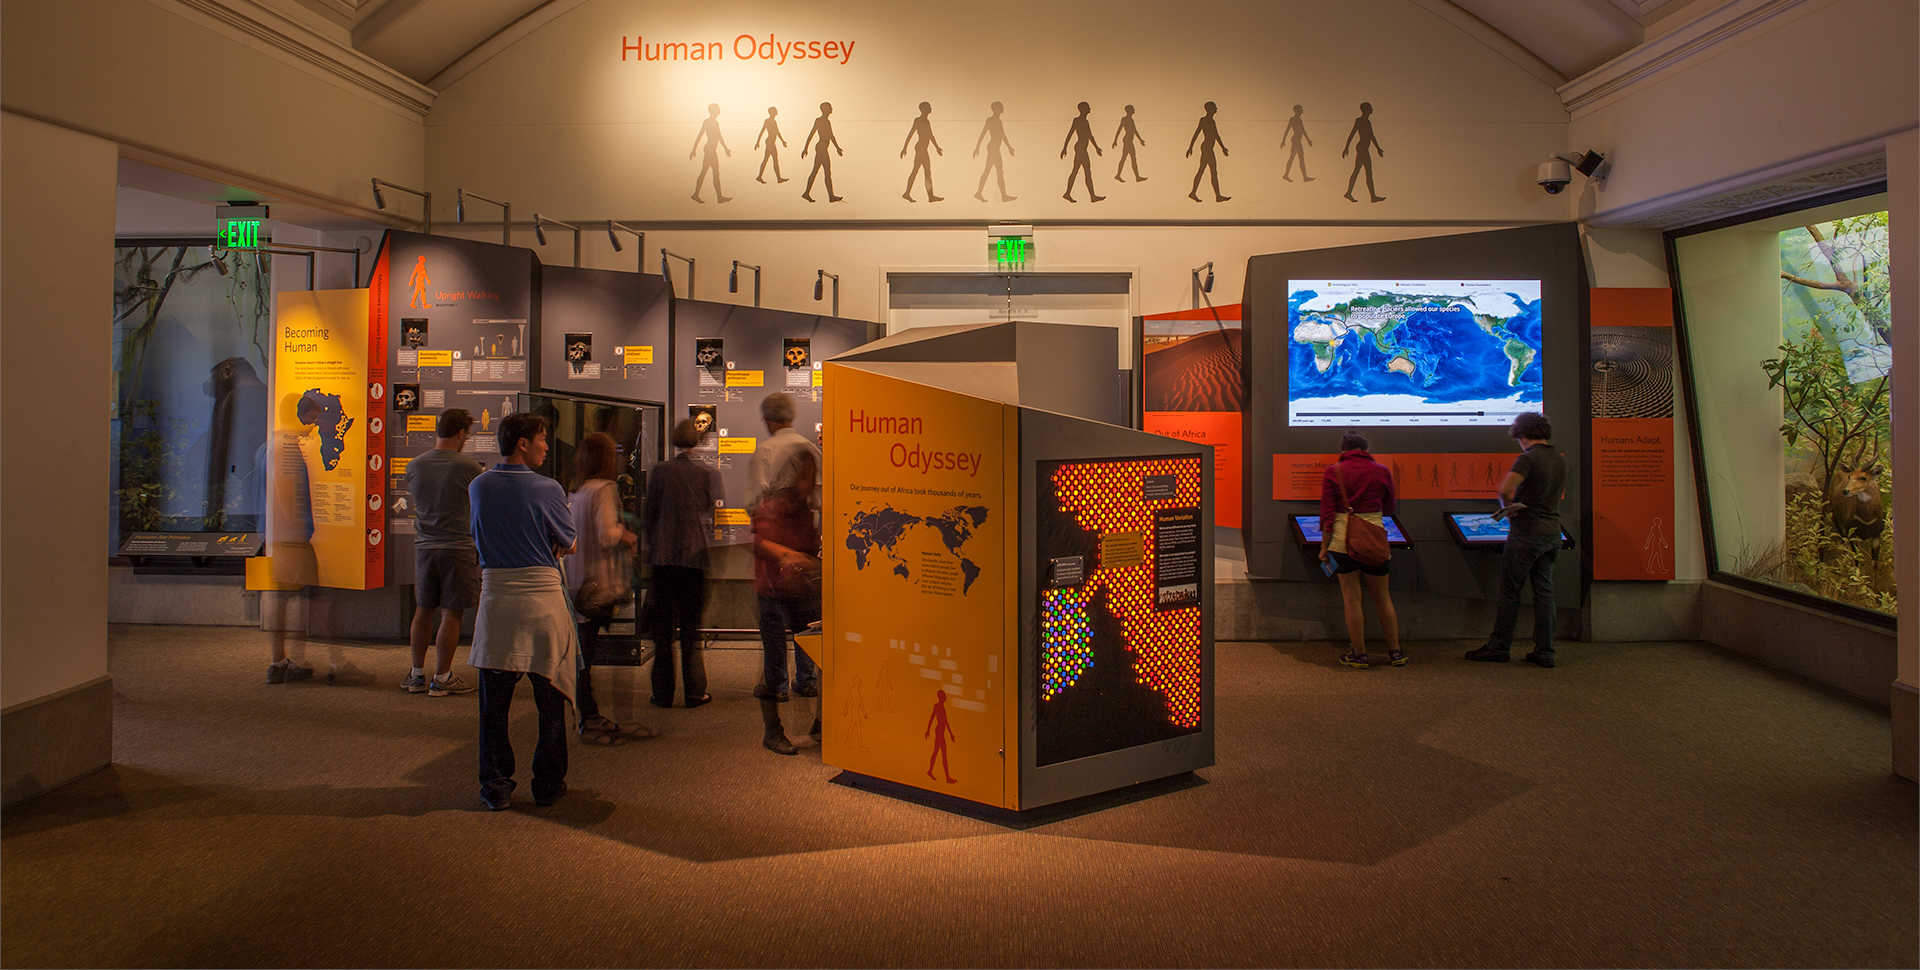 Visitors explore the Human Odyssey exhibit.